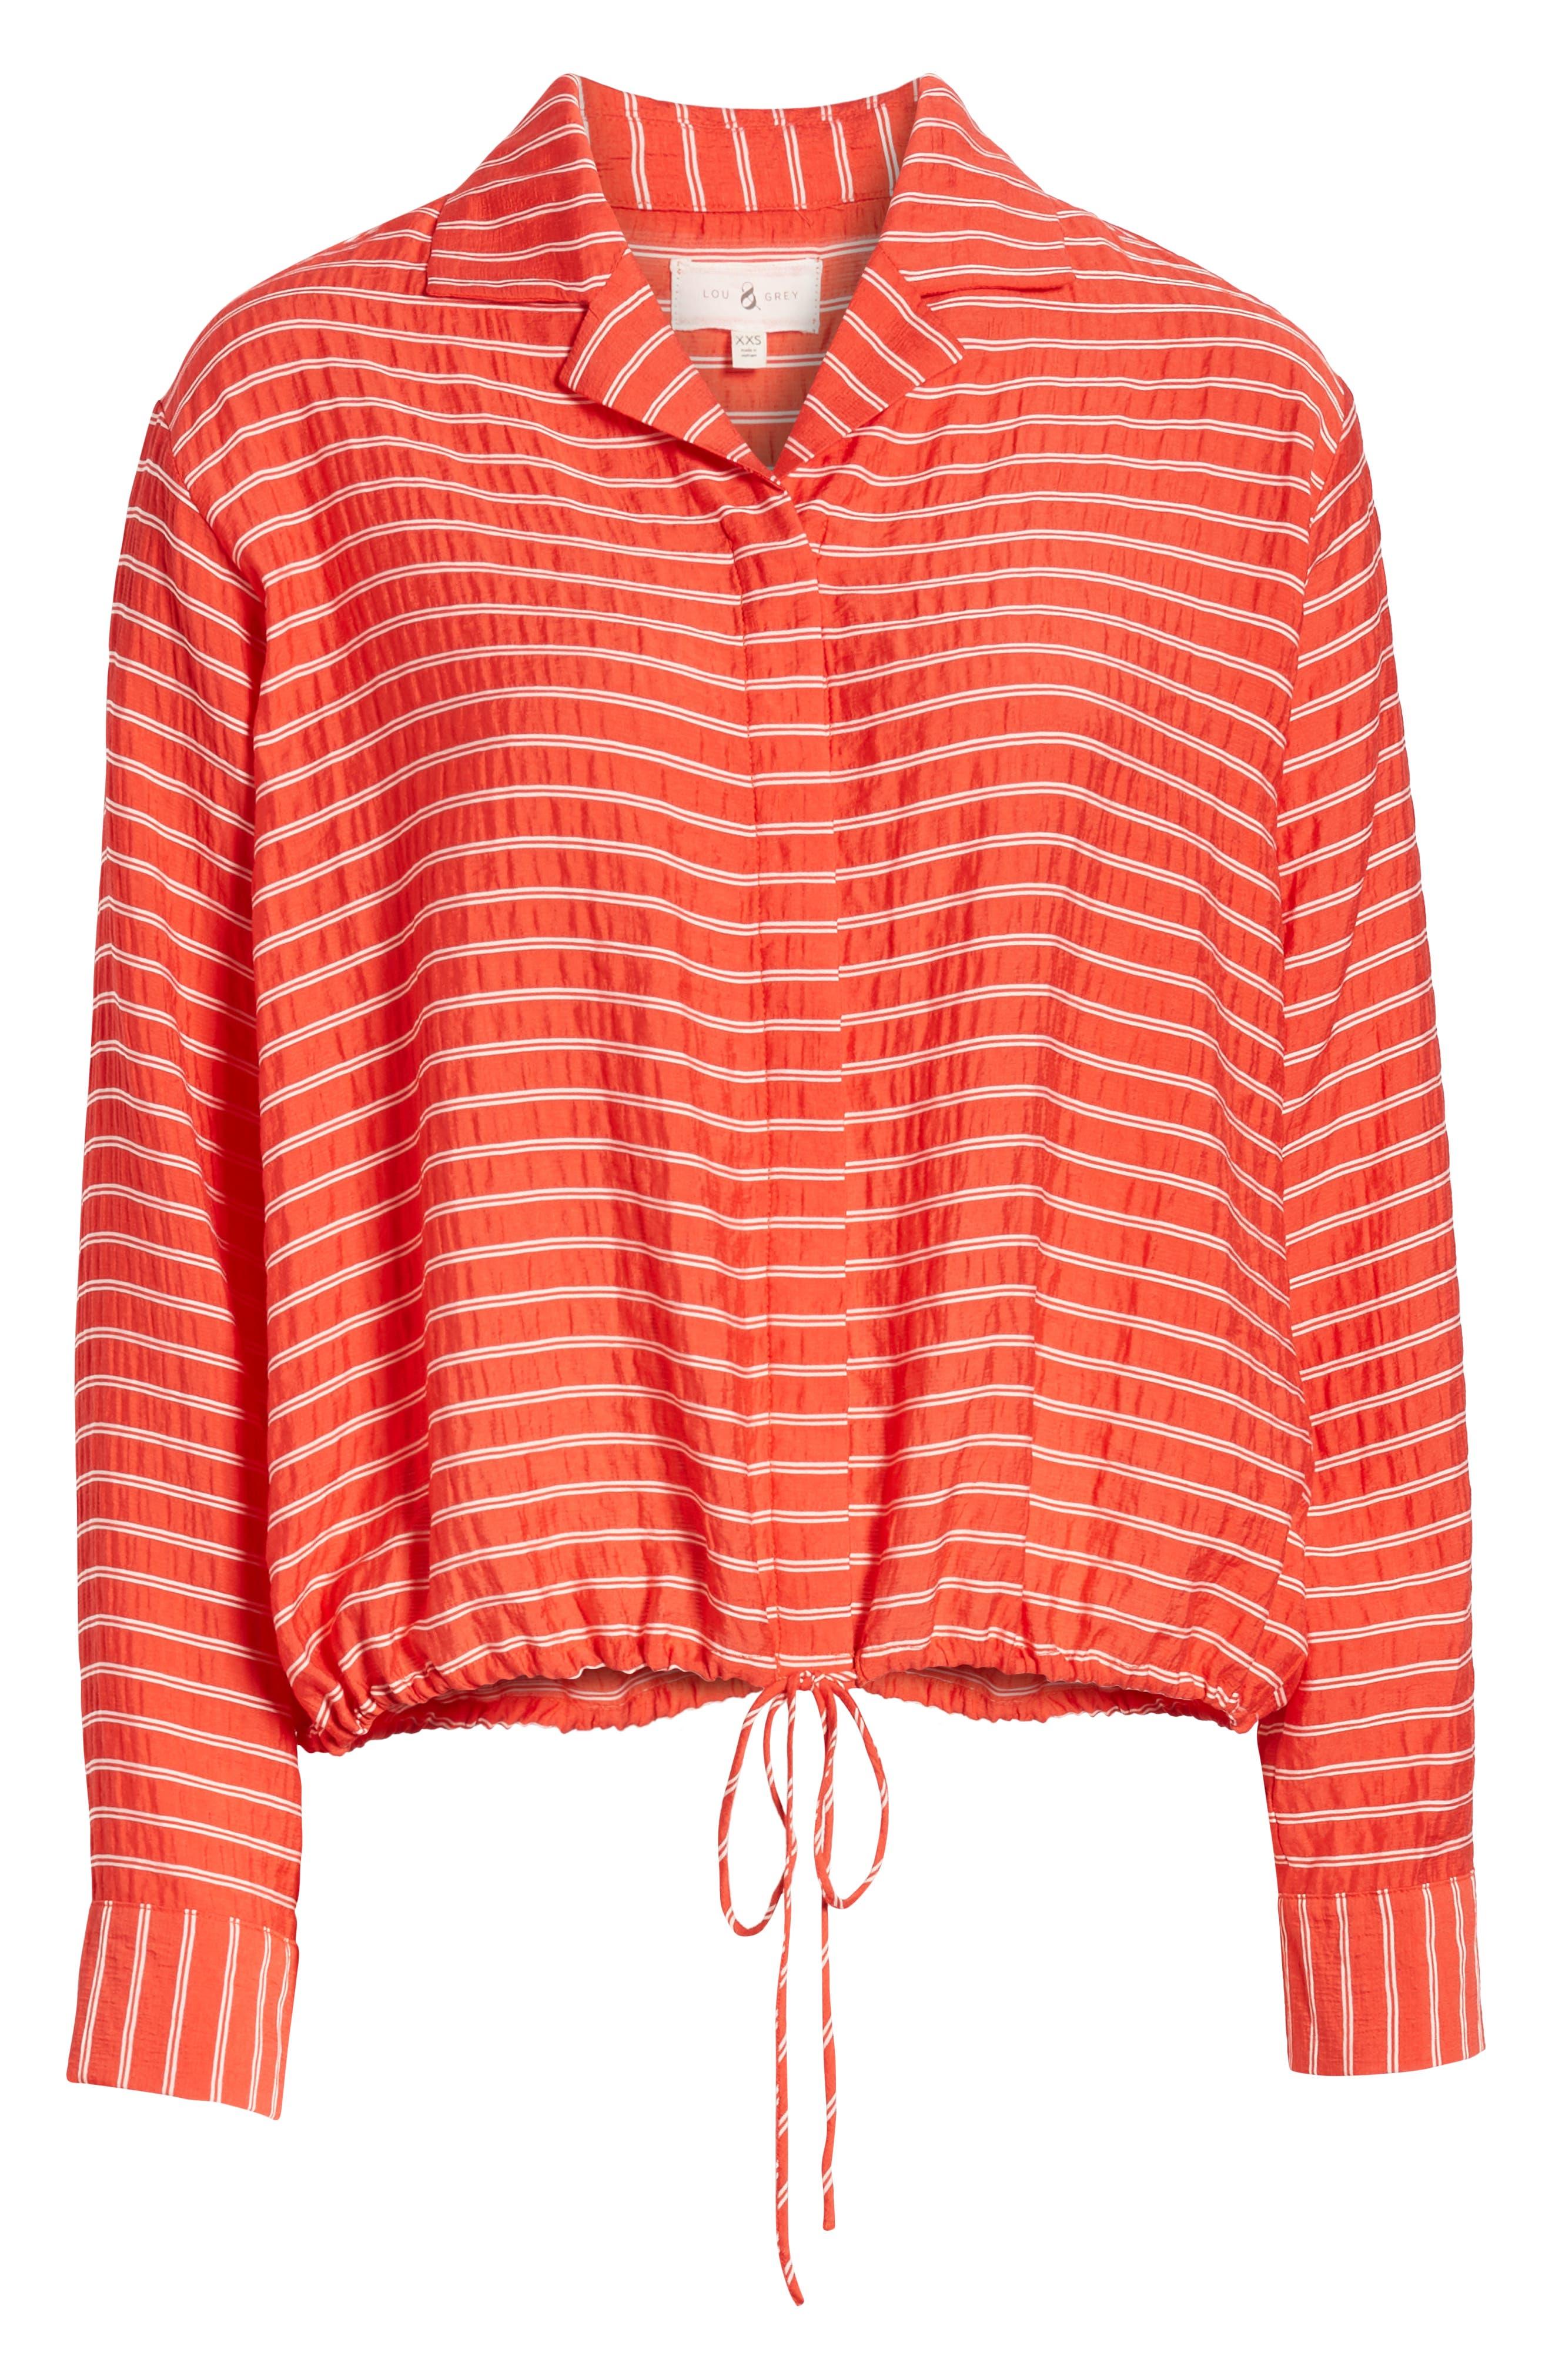 LOU & GREY, Sunny Stripe Drawstring Waist Blouse, Alternate thumbnail 6, color, 600